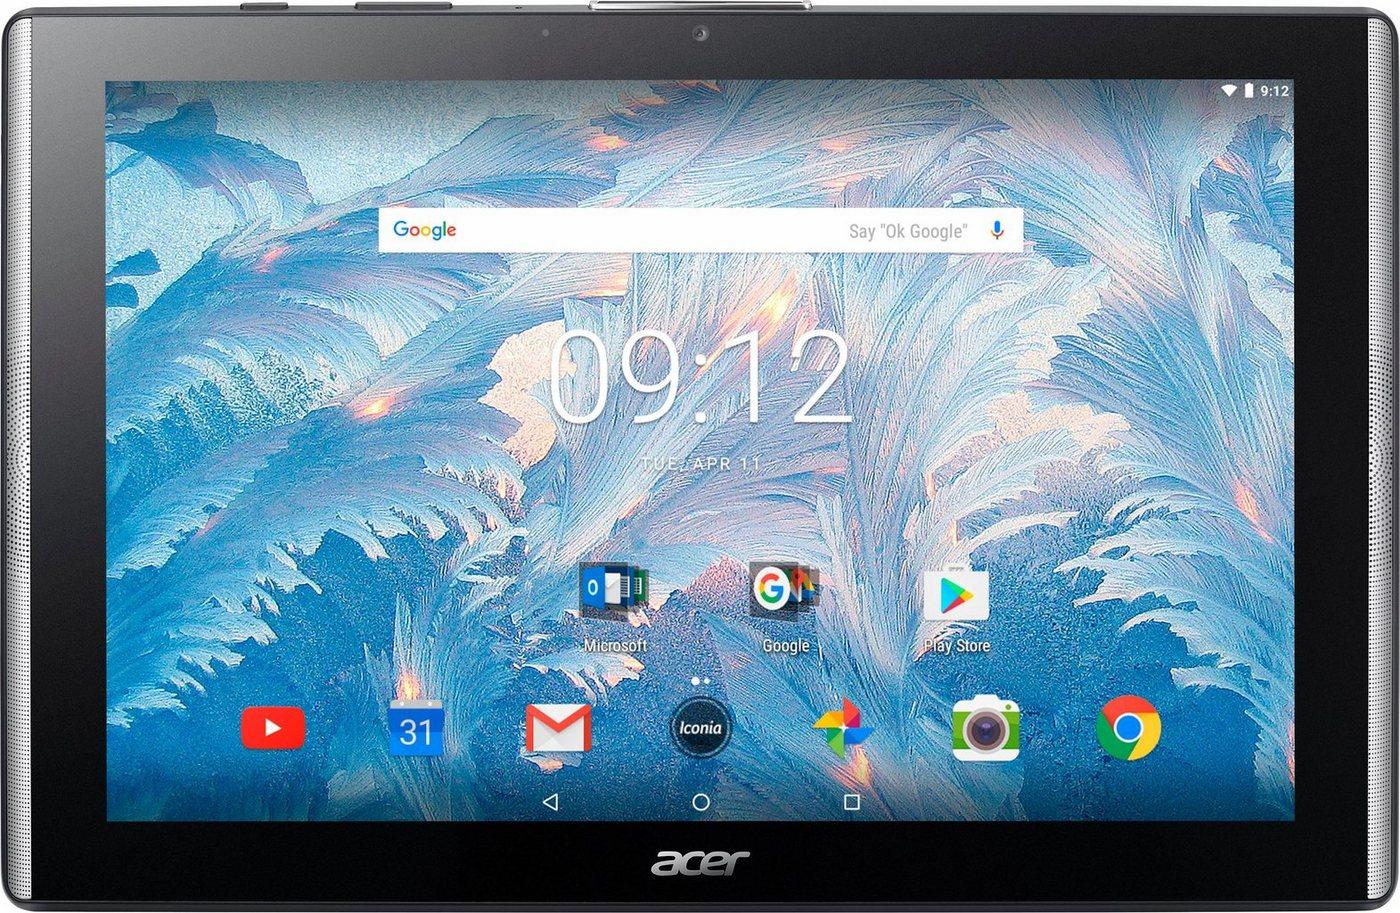 Acer Iconia One 10 - B3-A40, 16 GB Tablet-PC, Quad-Core, 25,7 cm (10,1 Zoll), 2048 MBDDR3L RAM - Preisvergleich